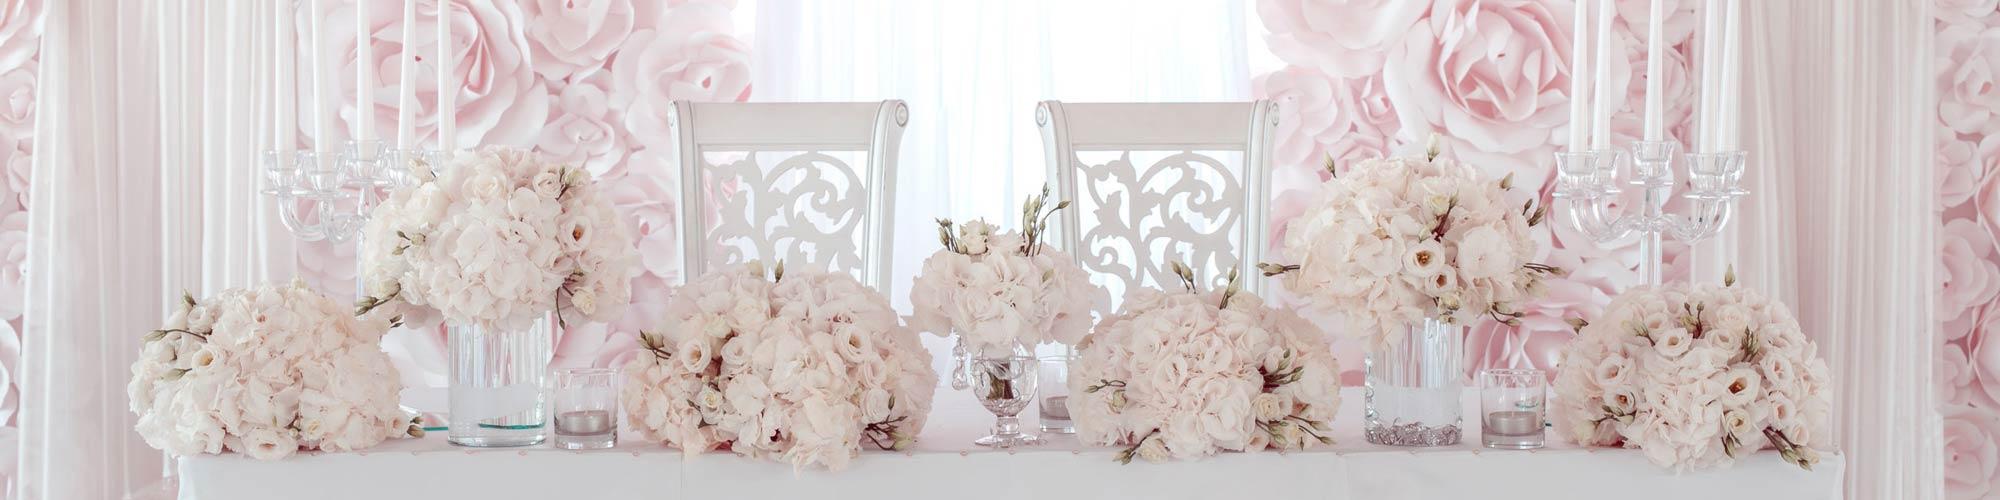 reception-the-wedding-pro